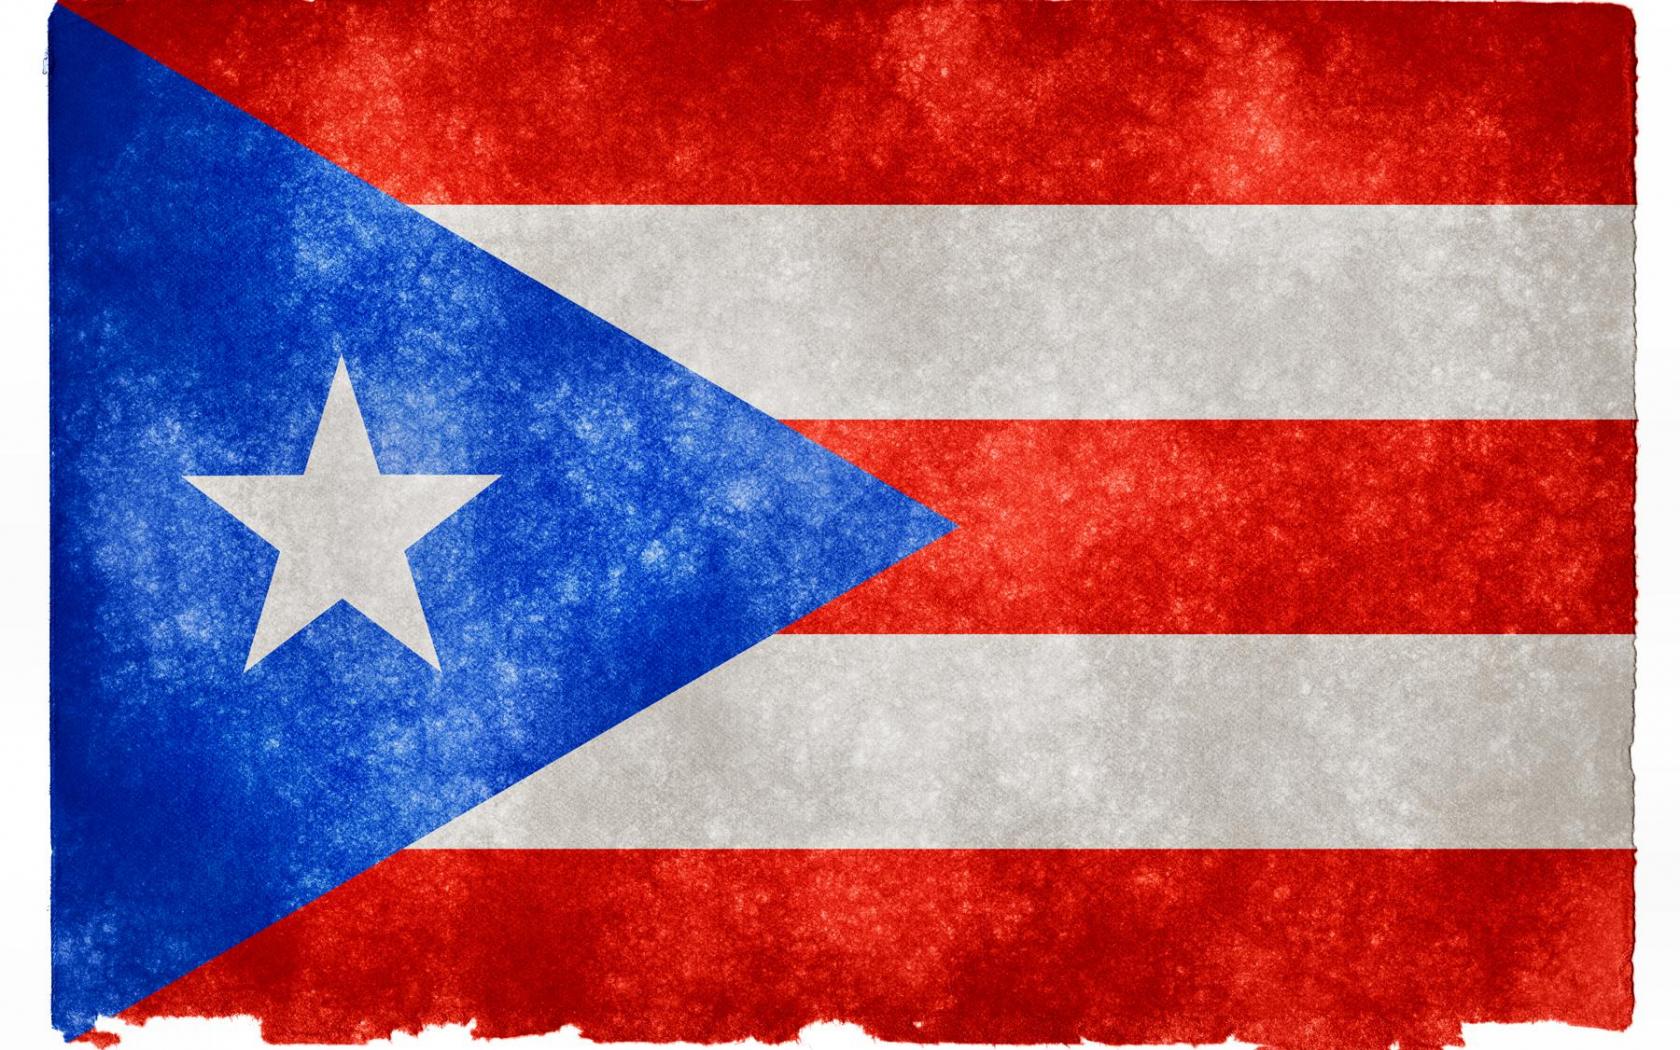 Free Download Puerto Rican Wallpapers 1800x1218 For Your Desktop